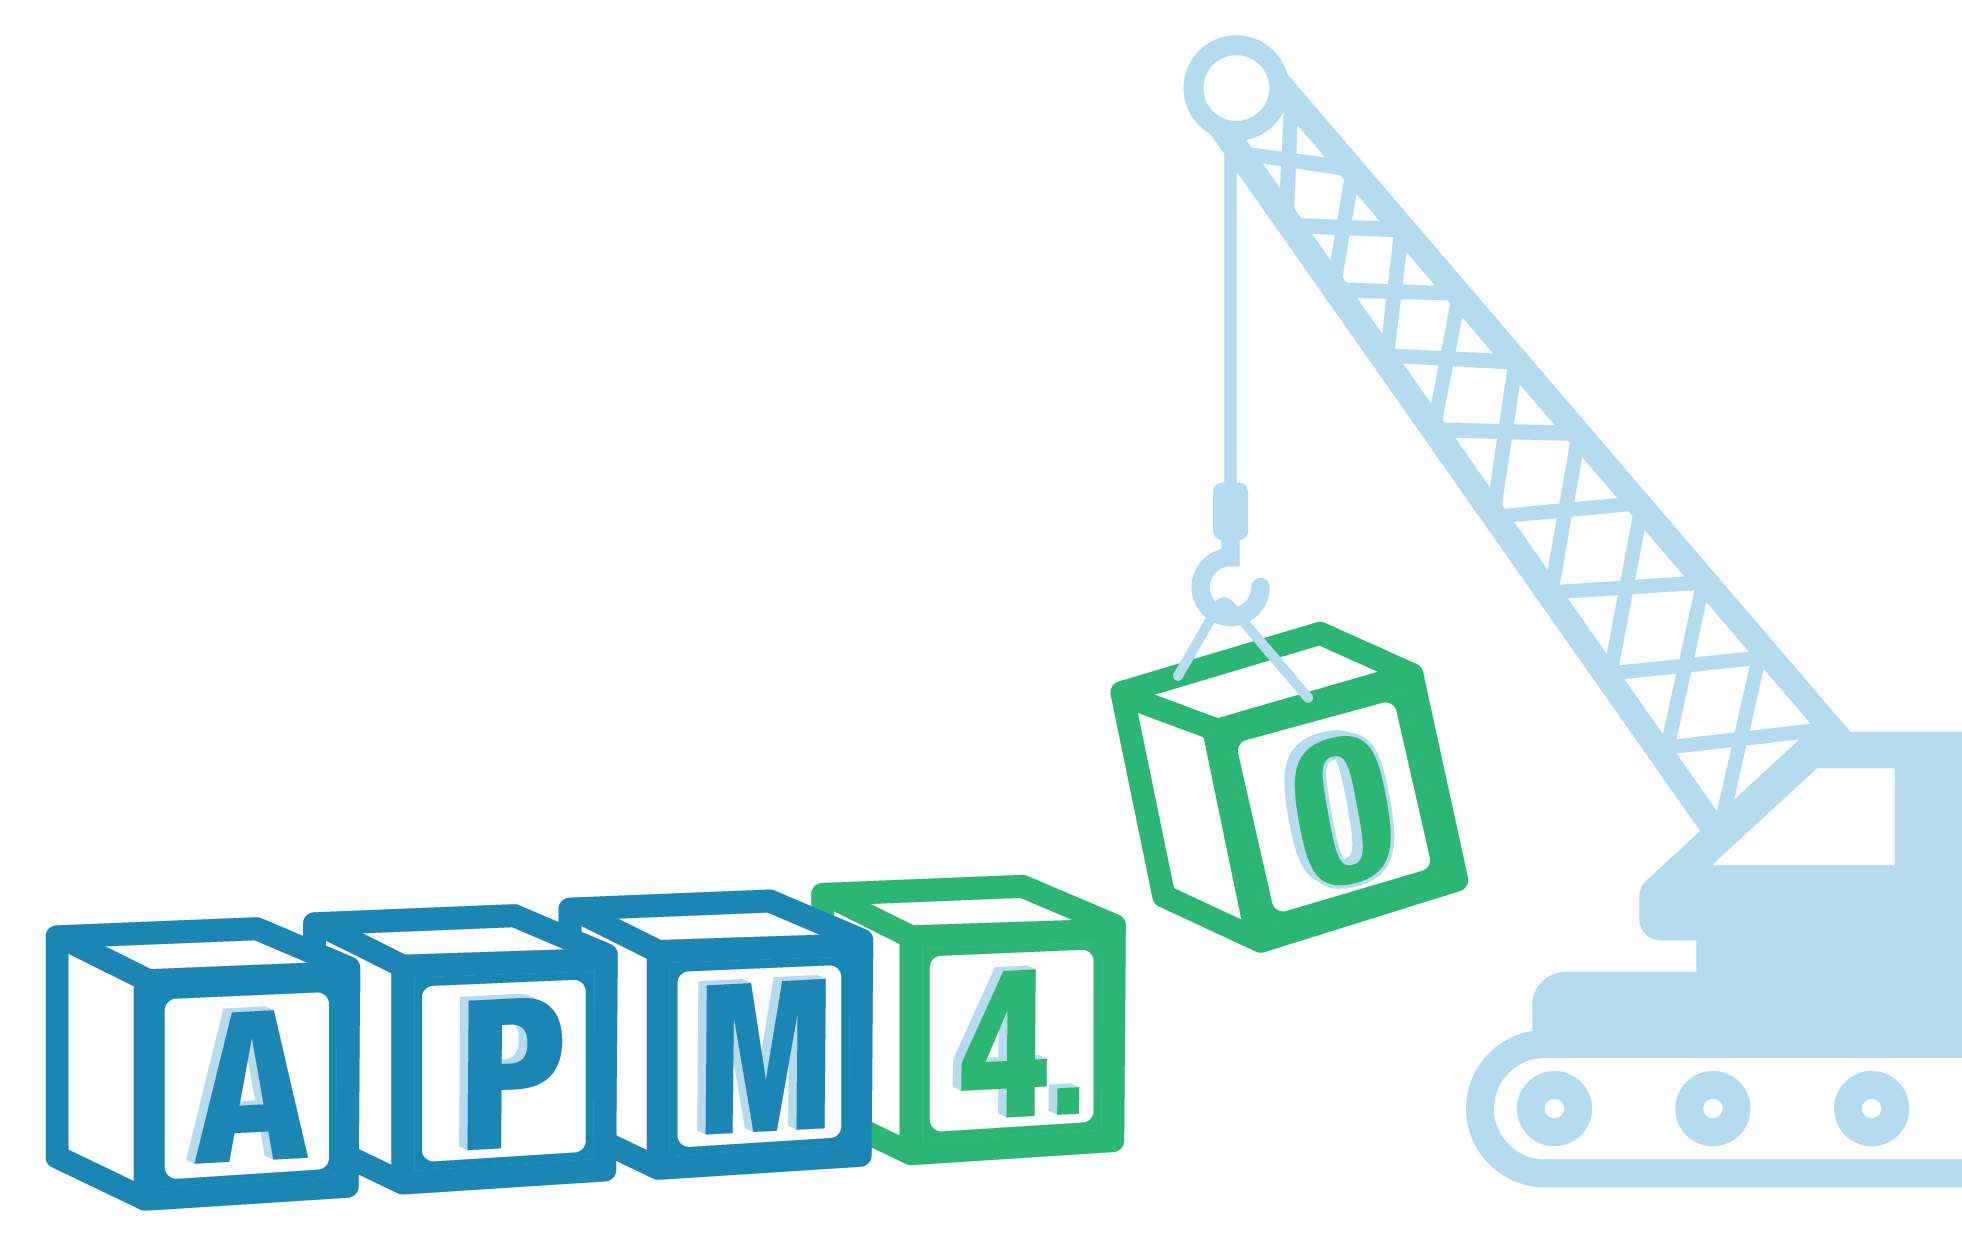 Apm logo clipart image download LNS Research Blog | Asset Performance Management (APM) image download